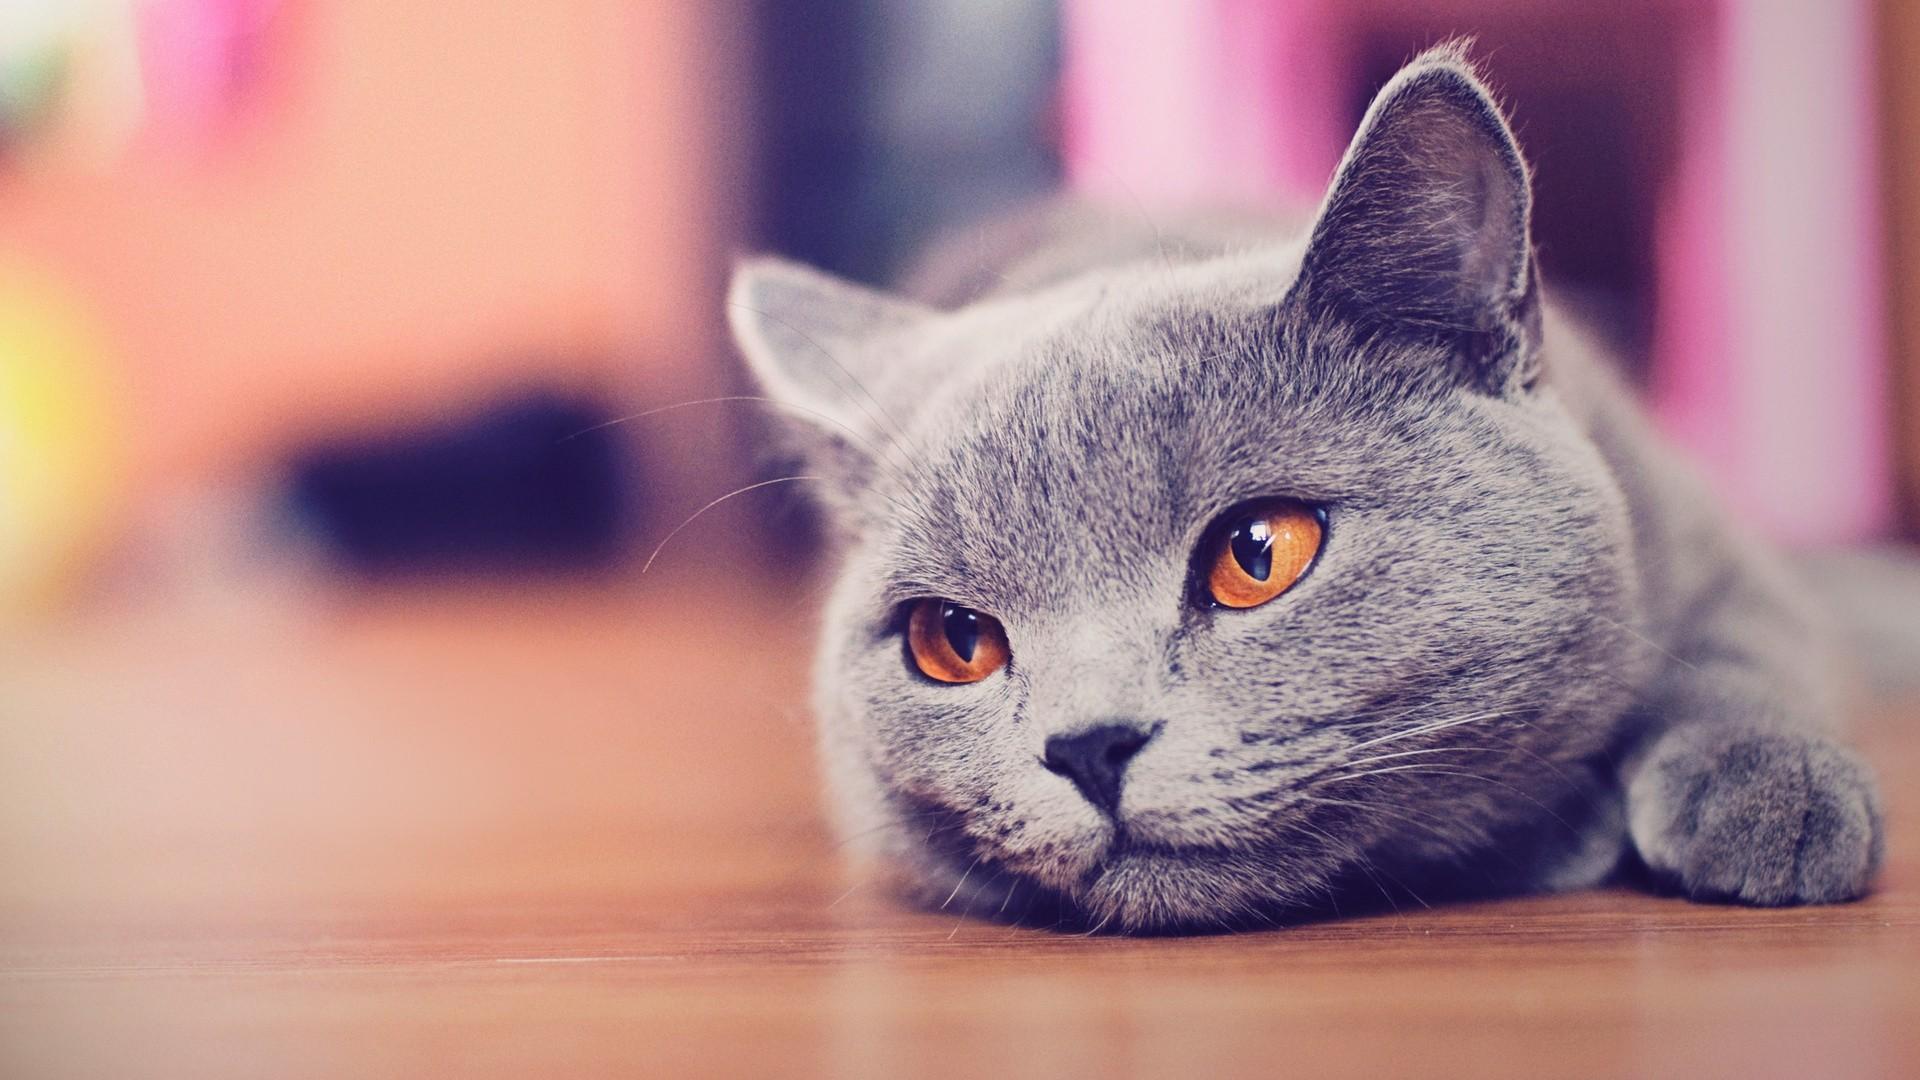 1920x1080 Lying Cat Hd – Galaxy Cat Wallpaper Iphone